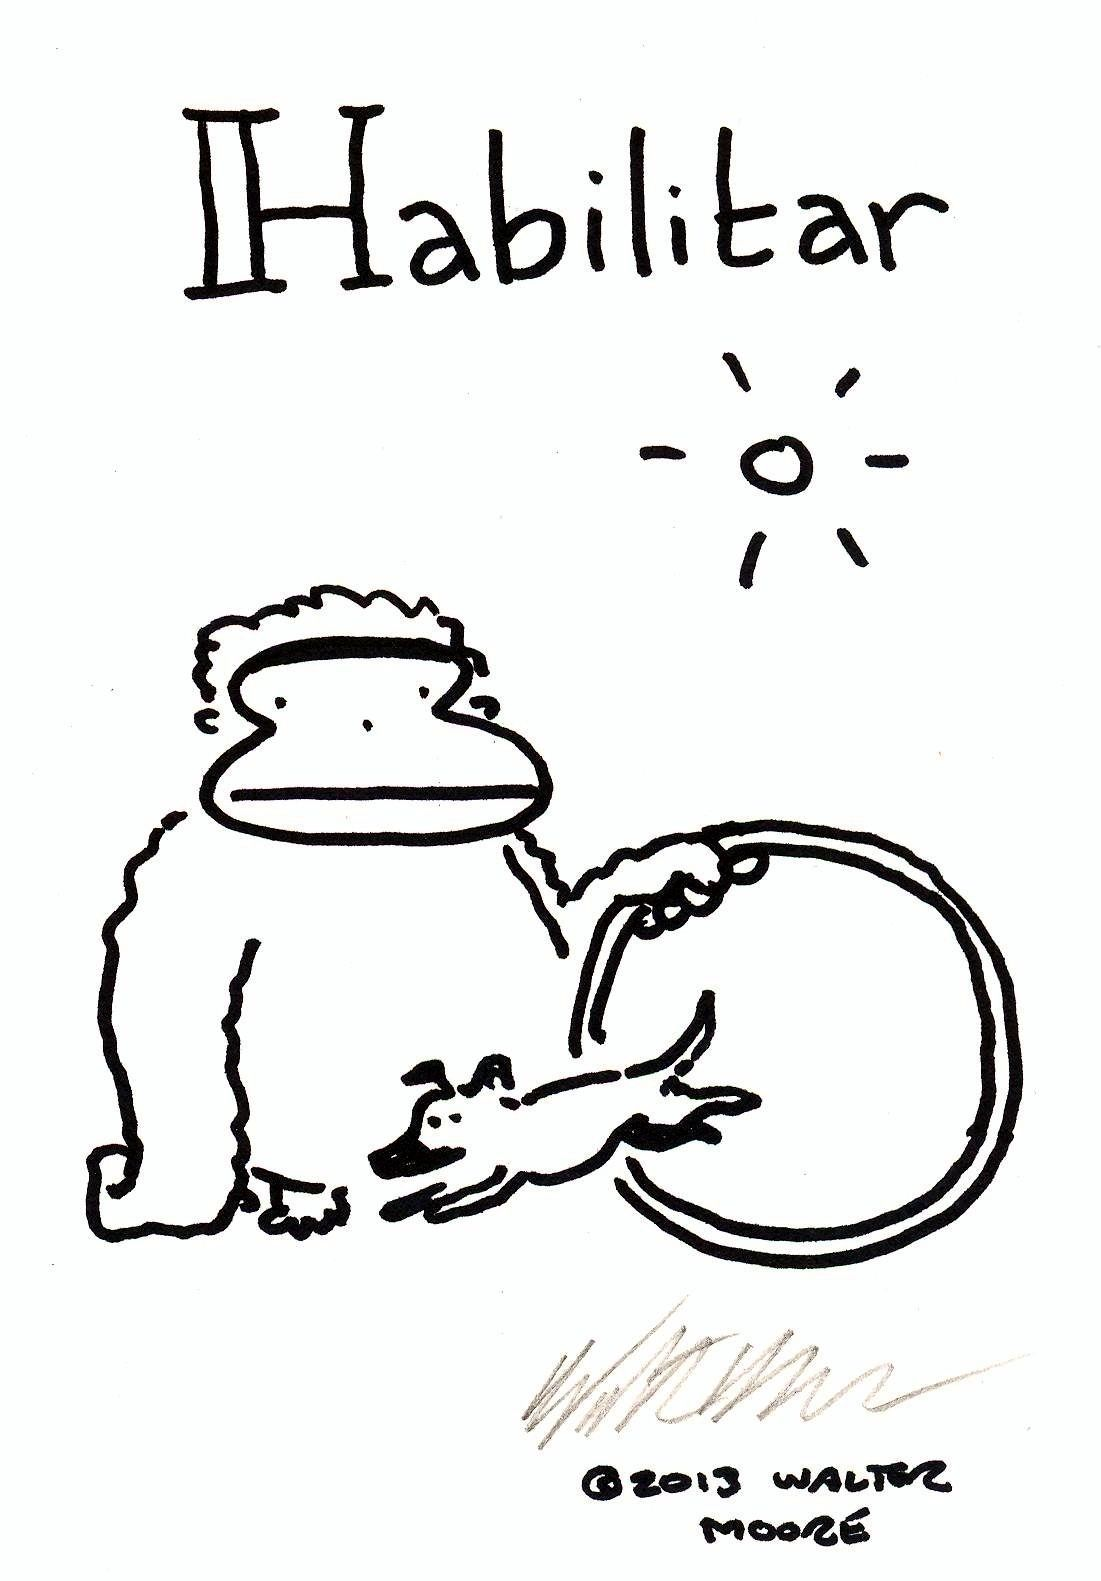 Spanish Apes: Habilitar. Original Signed Cartoon by Walter Moore